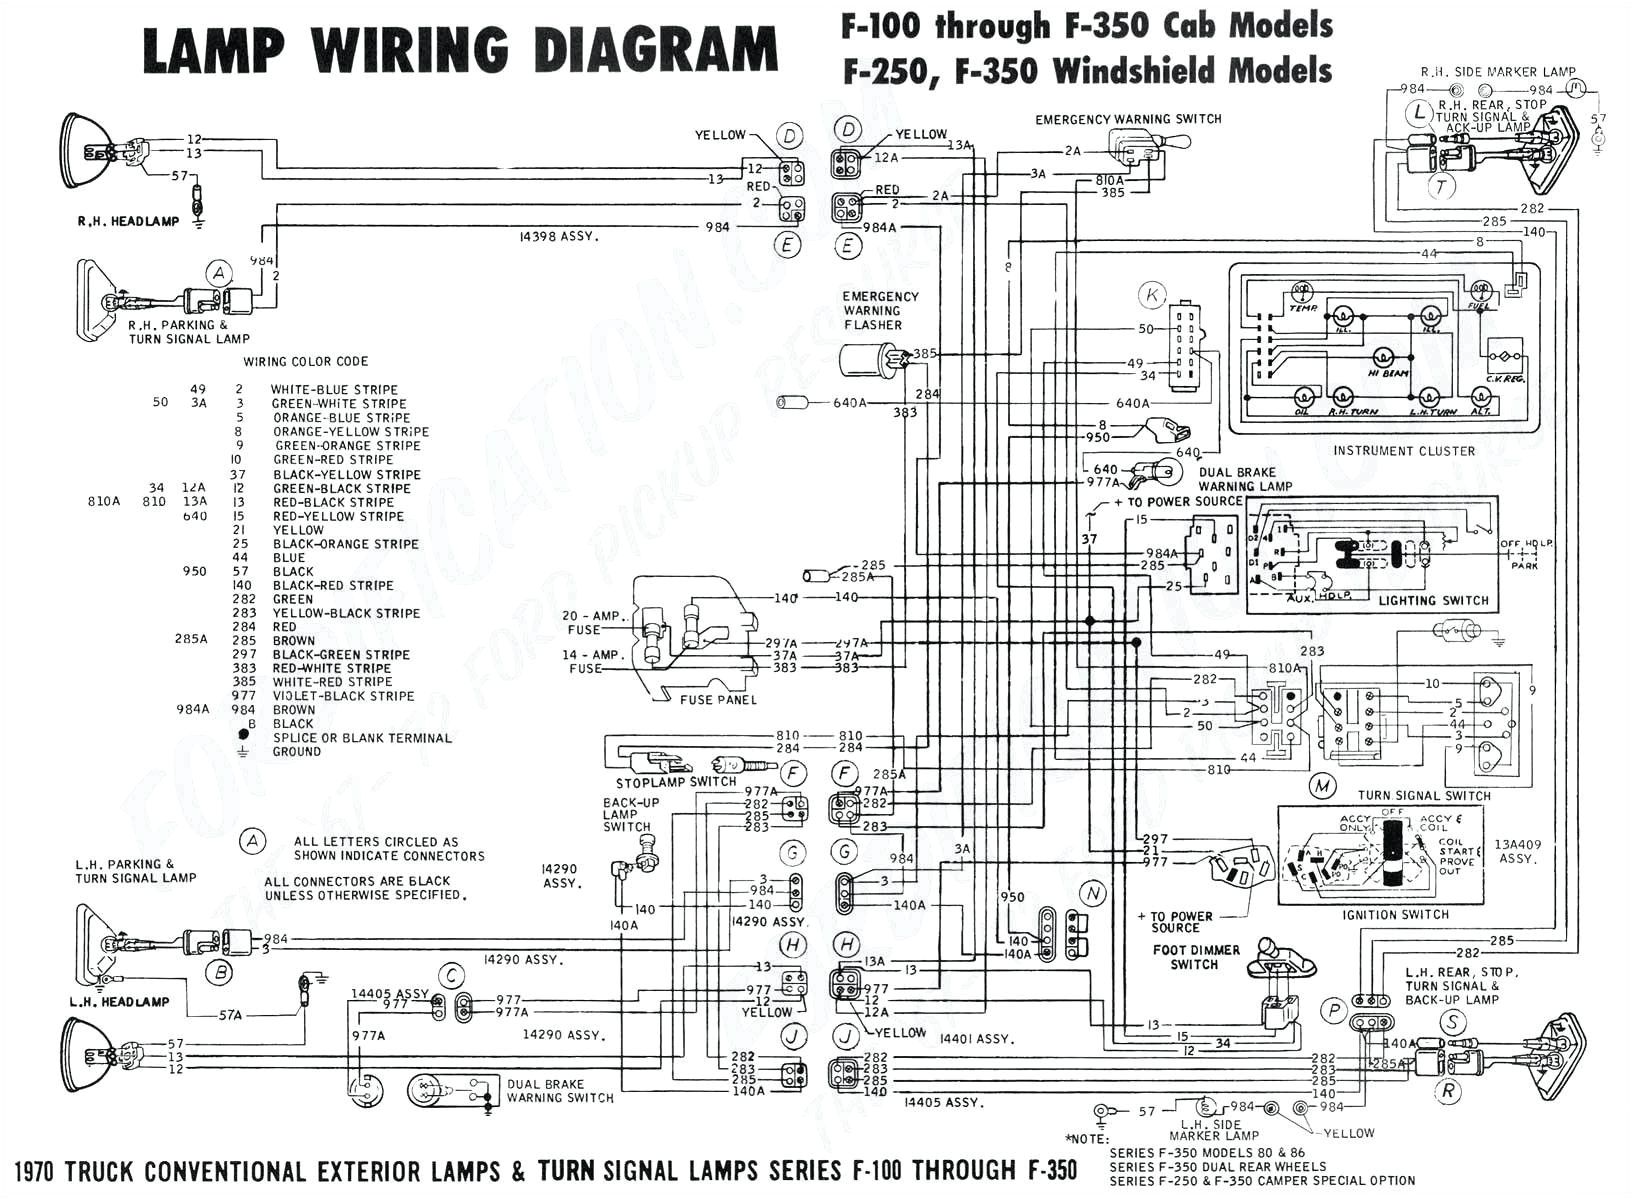 1990 dodge ram fuse box location z3 wiring library diagram